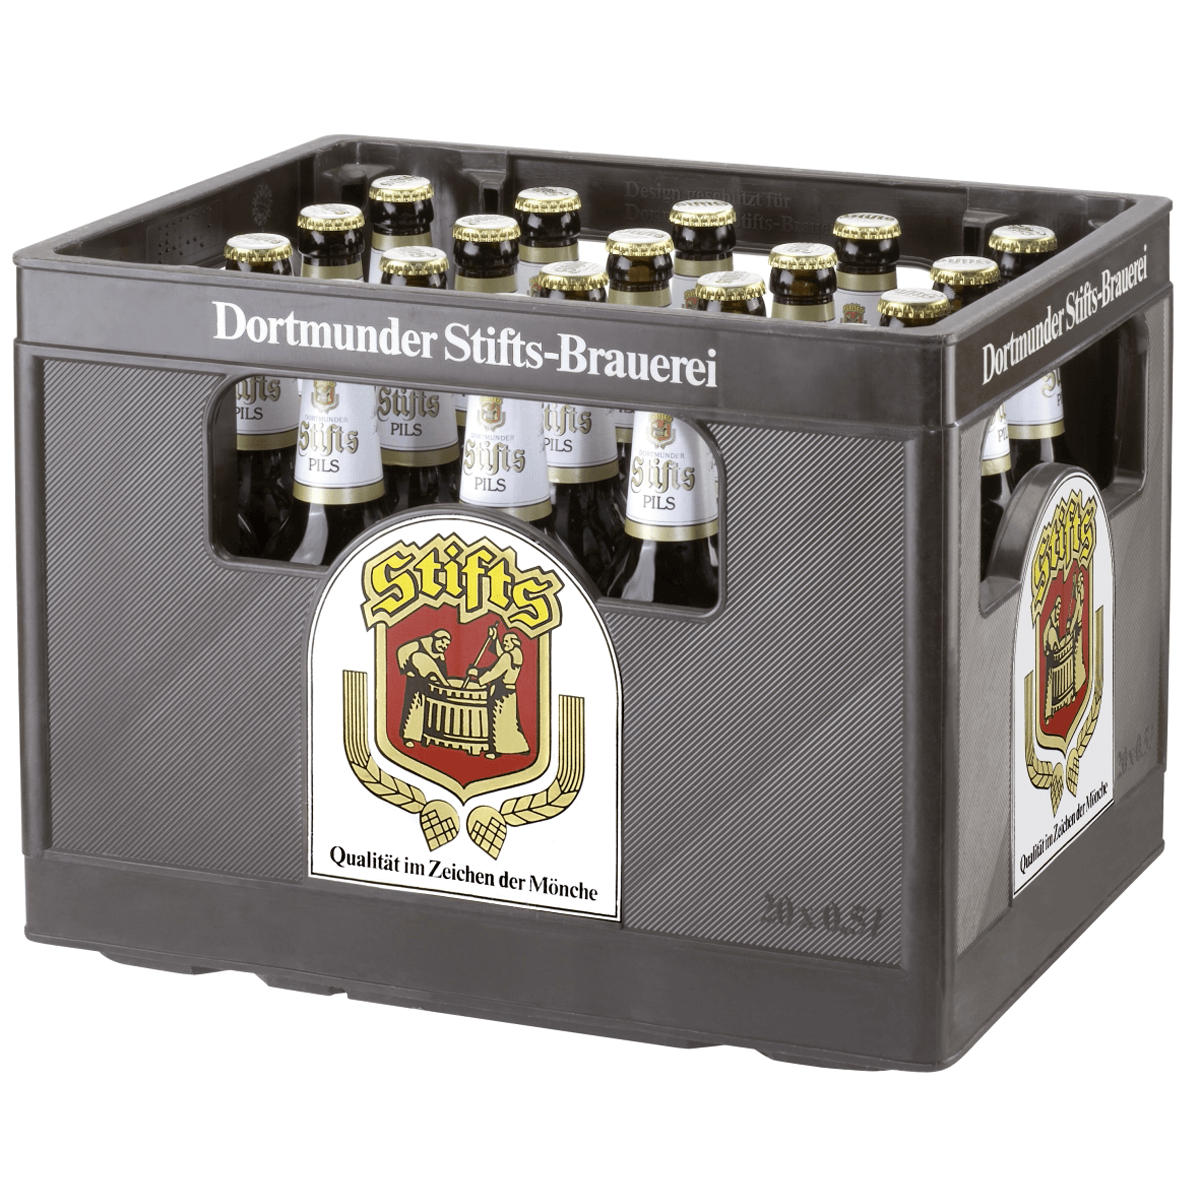 Stifts Pils 20 x 0,5L   Pils   Bier   Sortiment   Trinkgut